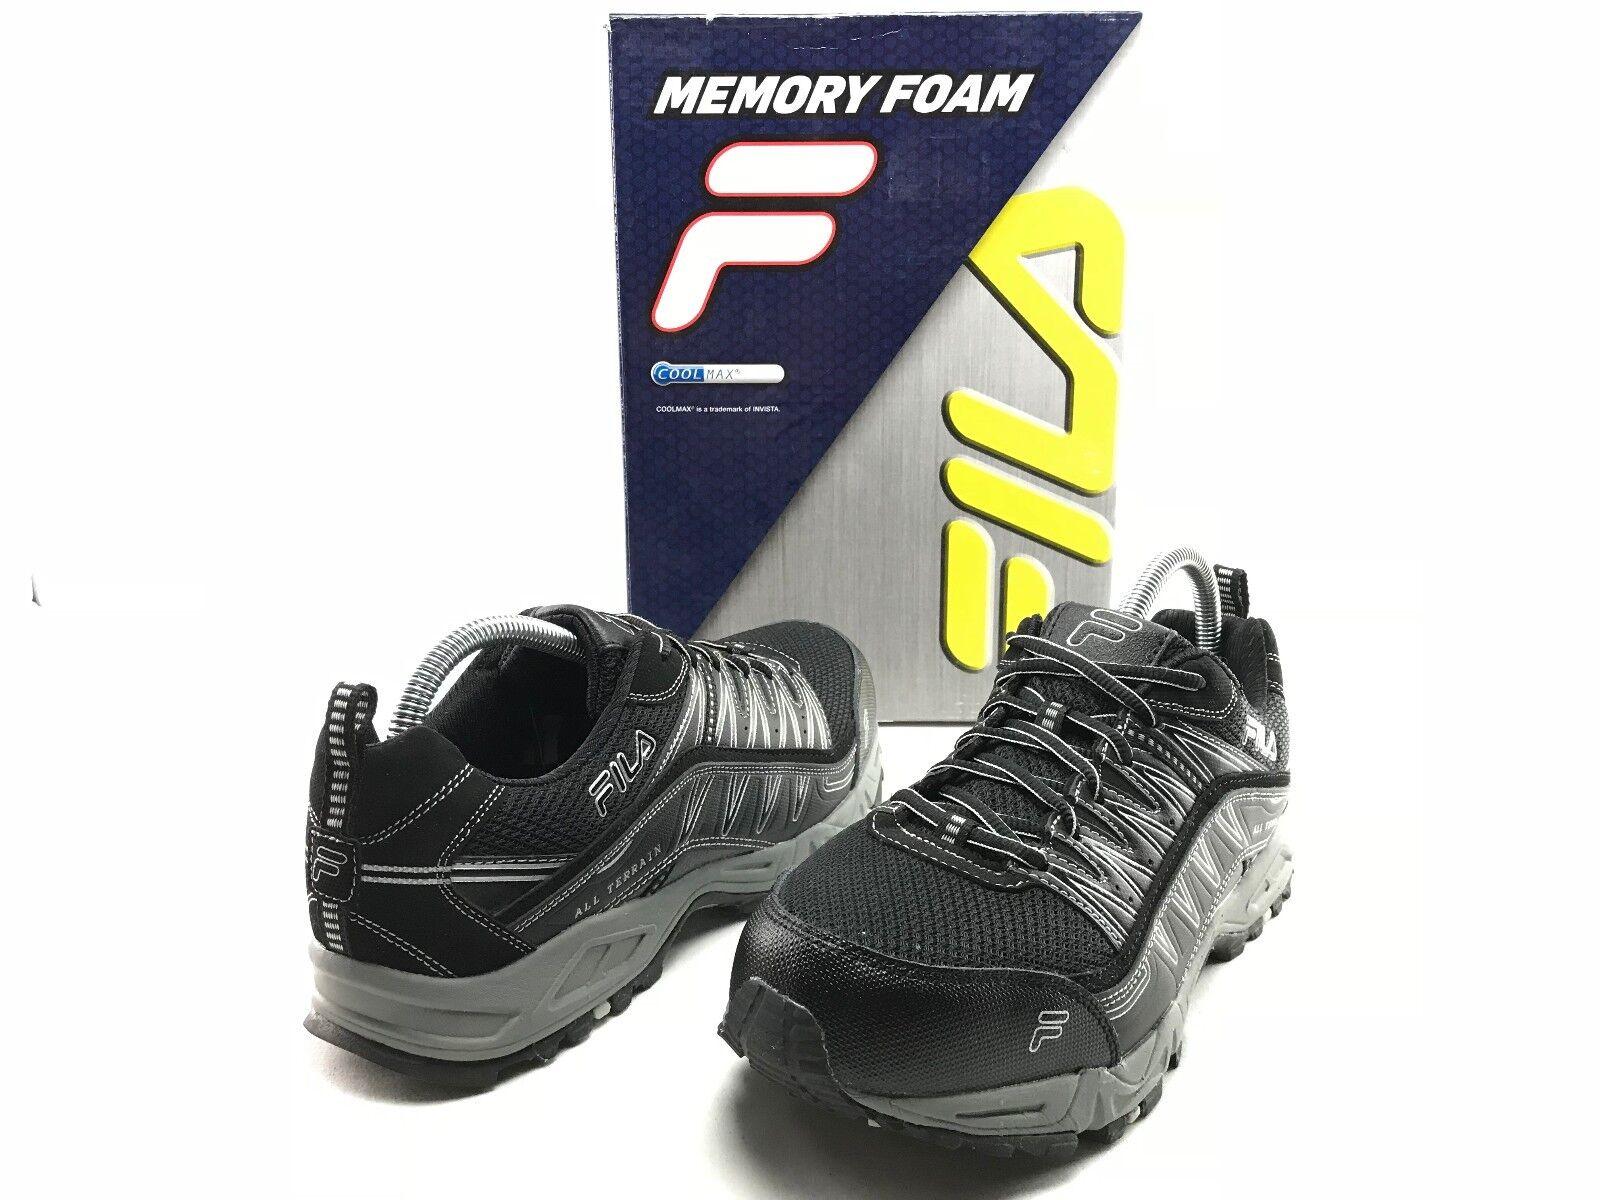 Skechers After Burn Men's Lace Up Memory Foam Training Sneakers US 9 Shoes B017 Seasonal price cuts, discount benefits